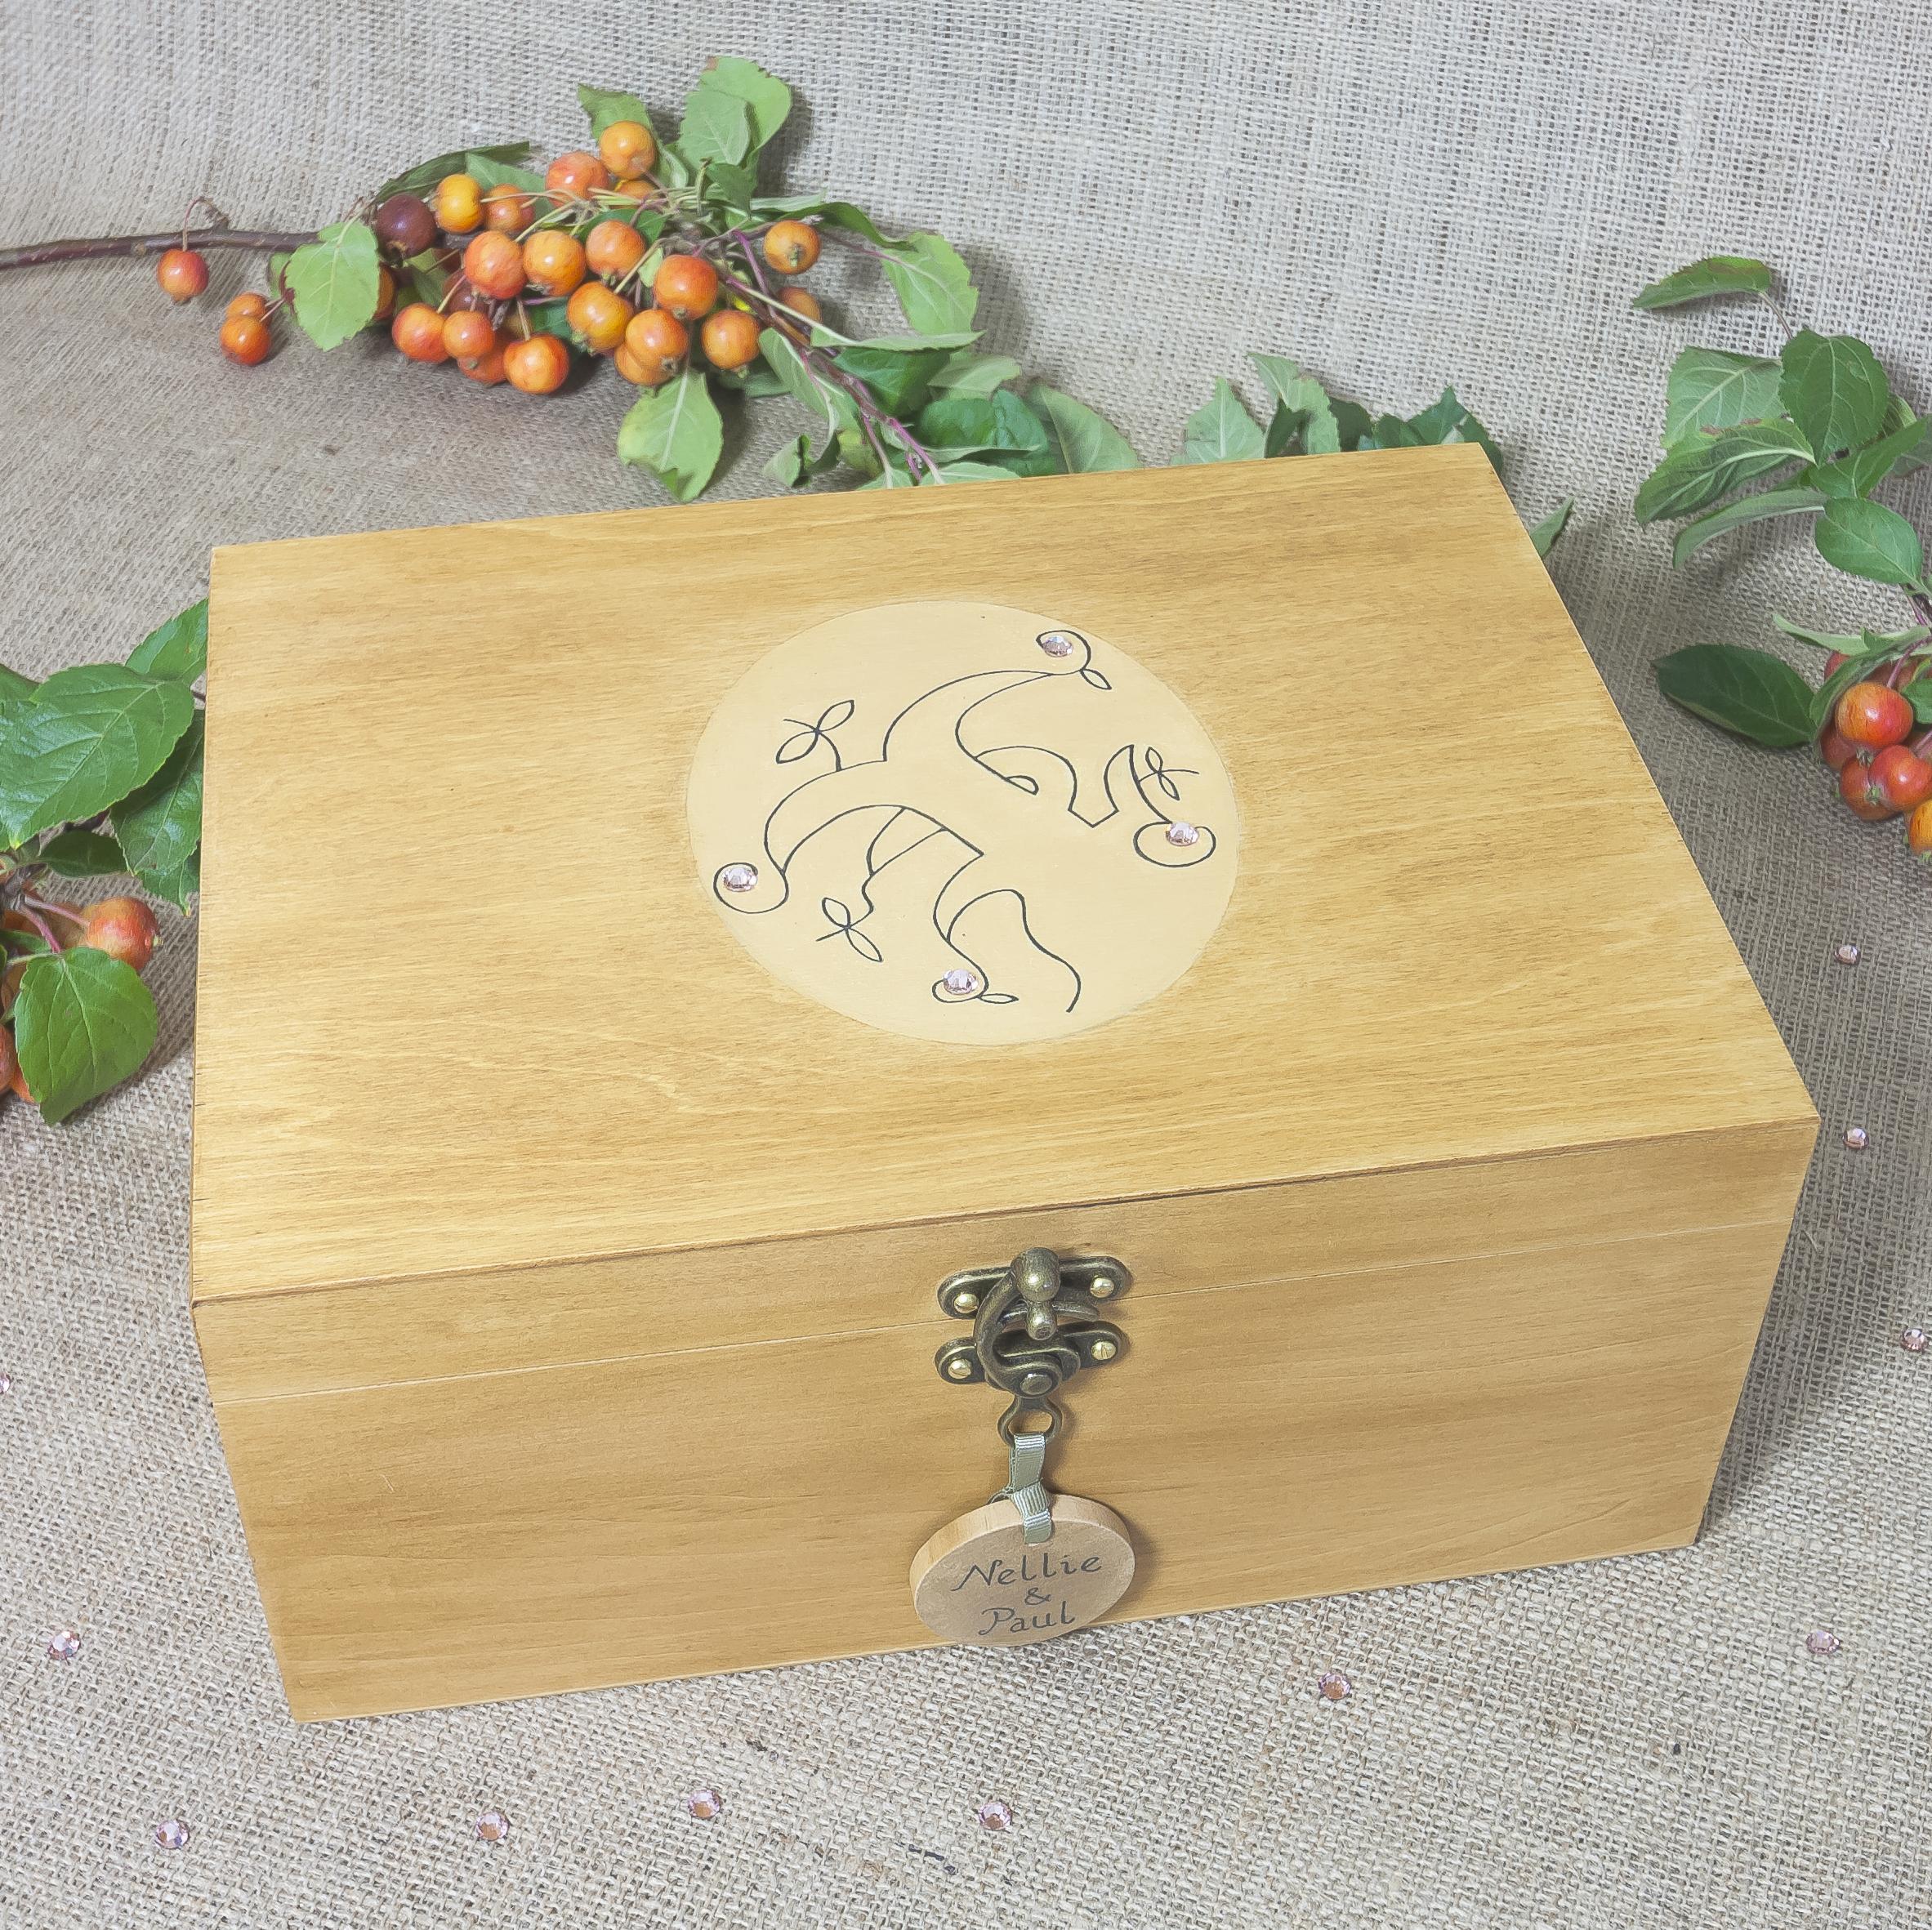 Tulip Cards.com - Handmade Wedding Stationary and Keepsakes